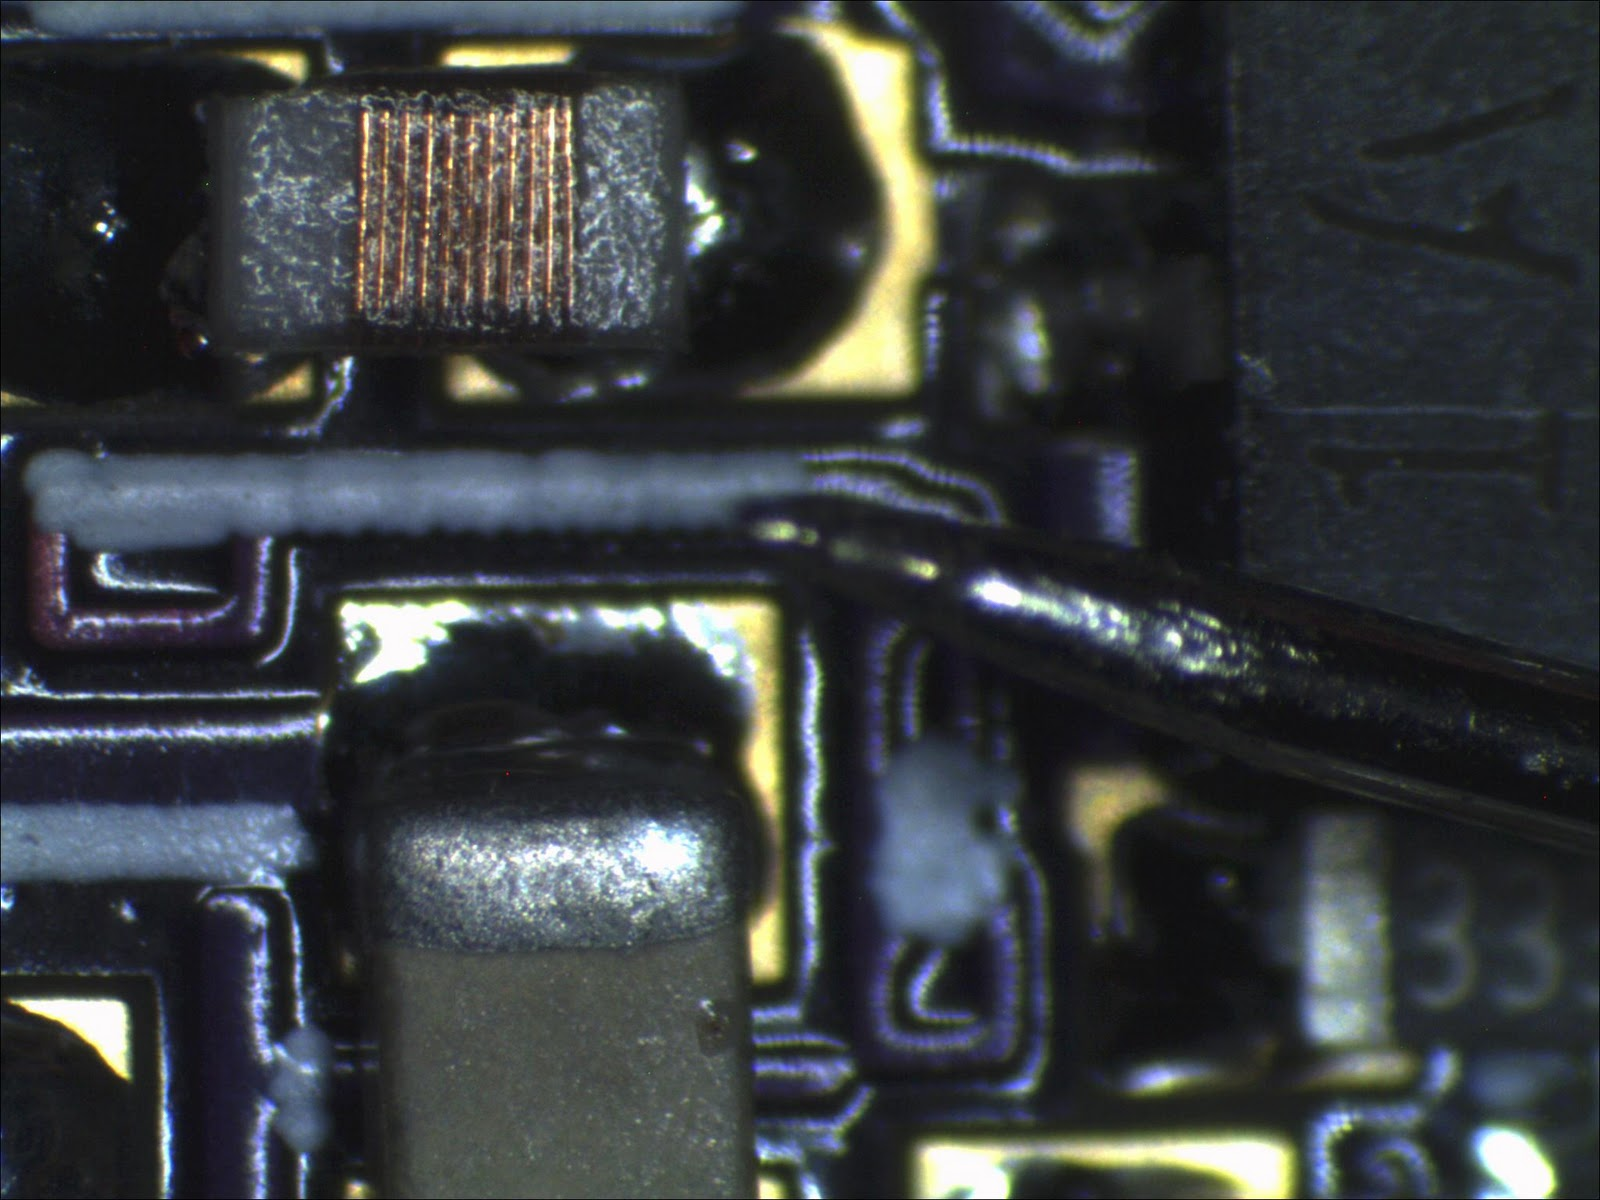 Wa0uwh Electronics Ham Radio Blog December 2011 Micro Fm Transmitter Resonate Coil And